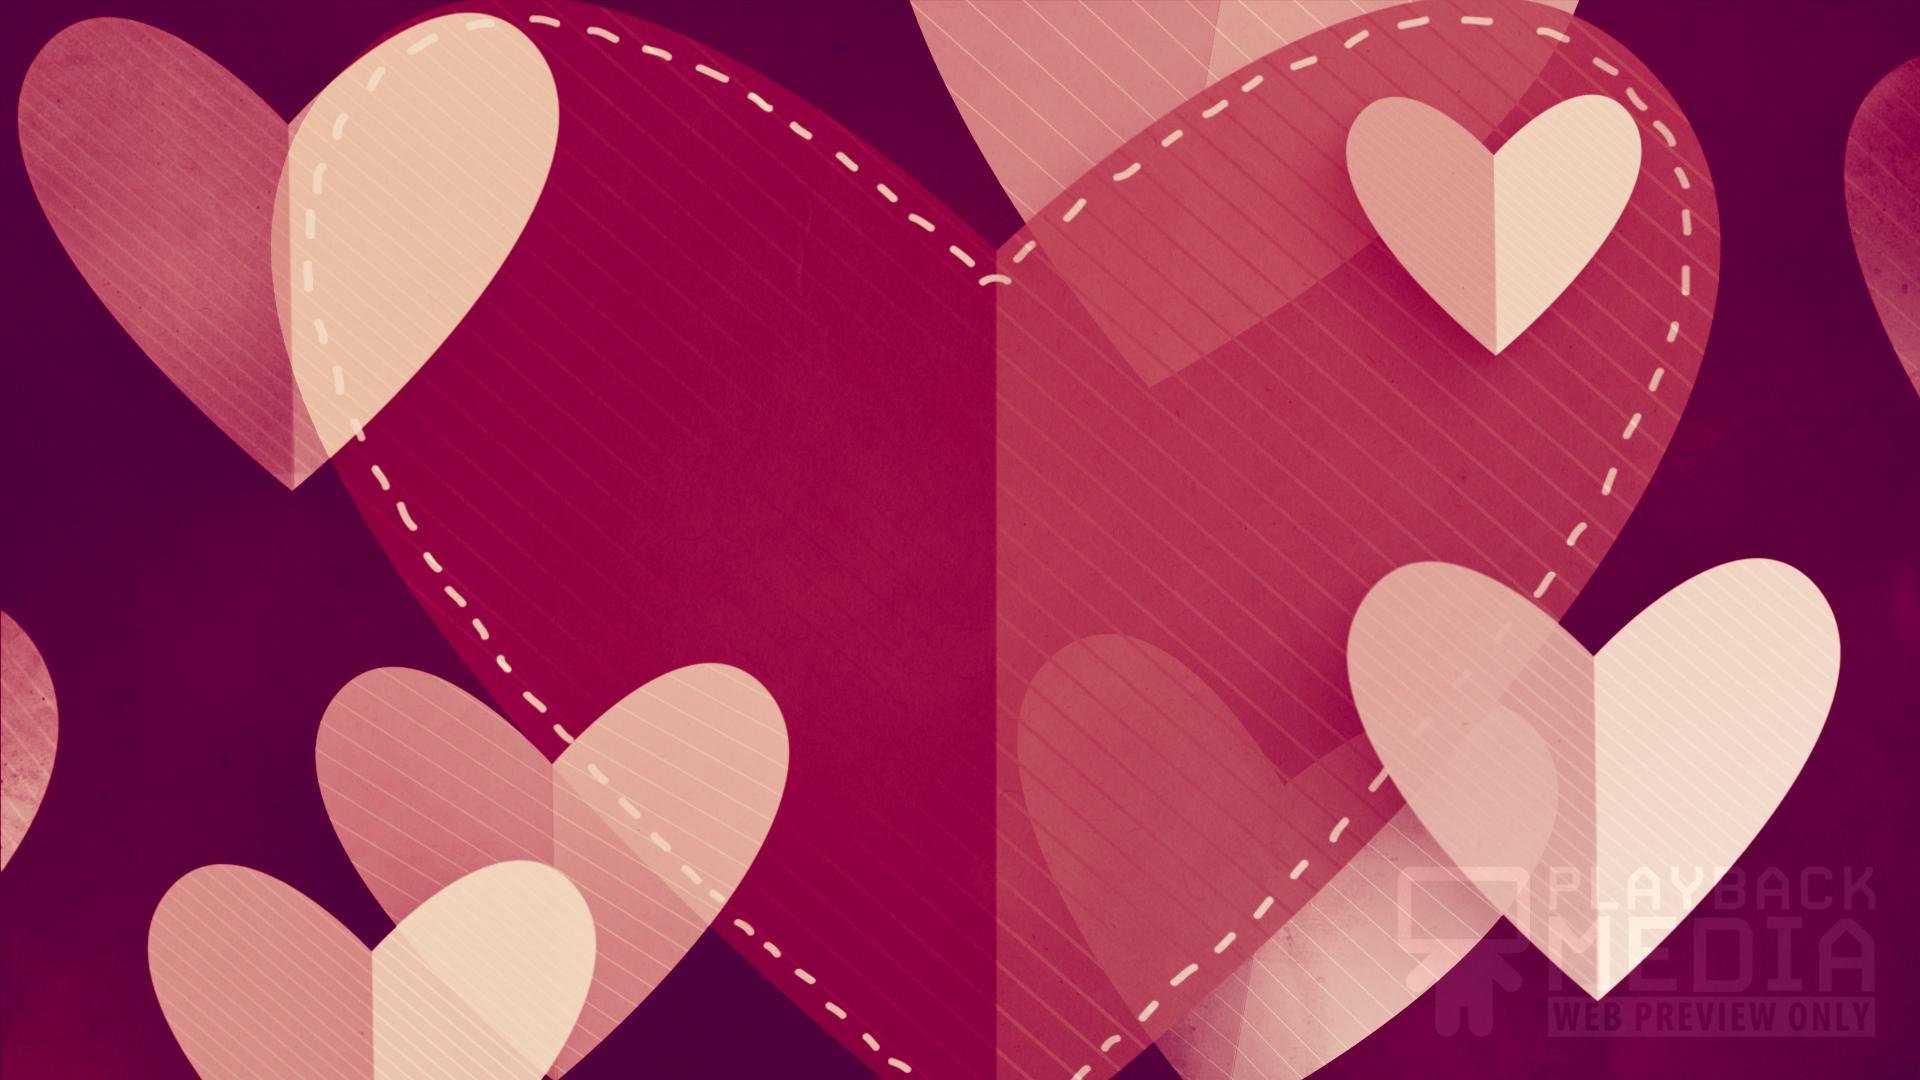 Heartfelt Love Motion 2 Image